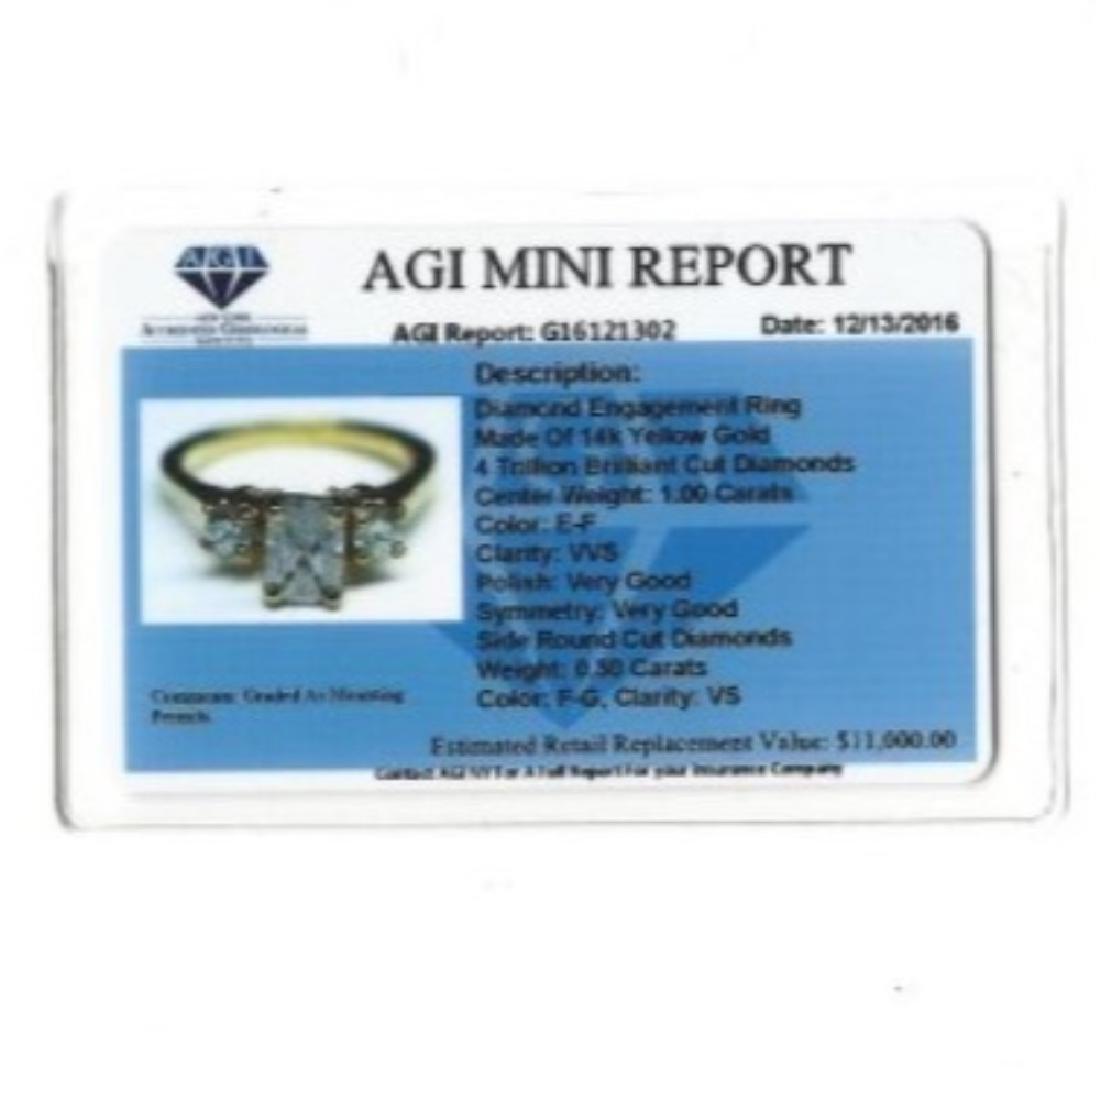 14K Gold and 1.20 Carat VVS White Diamond Ring (GIA) - 3